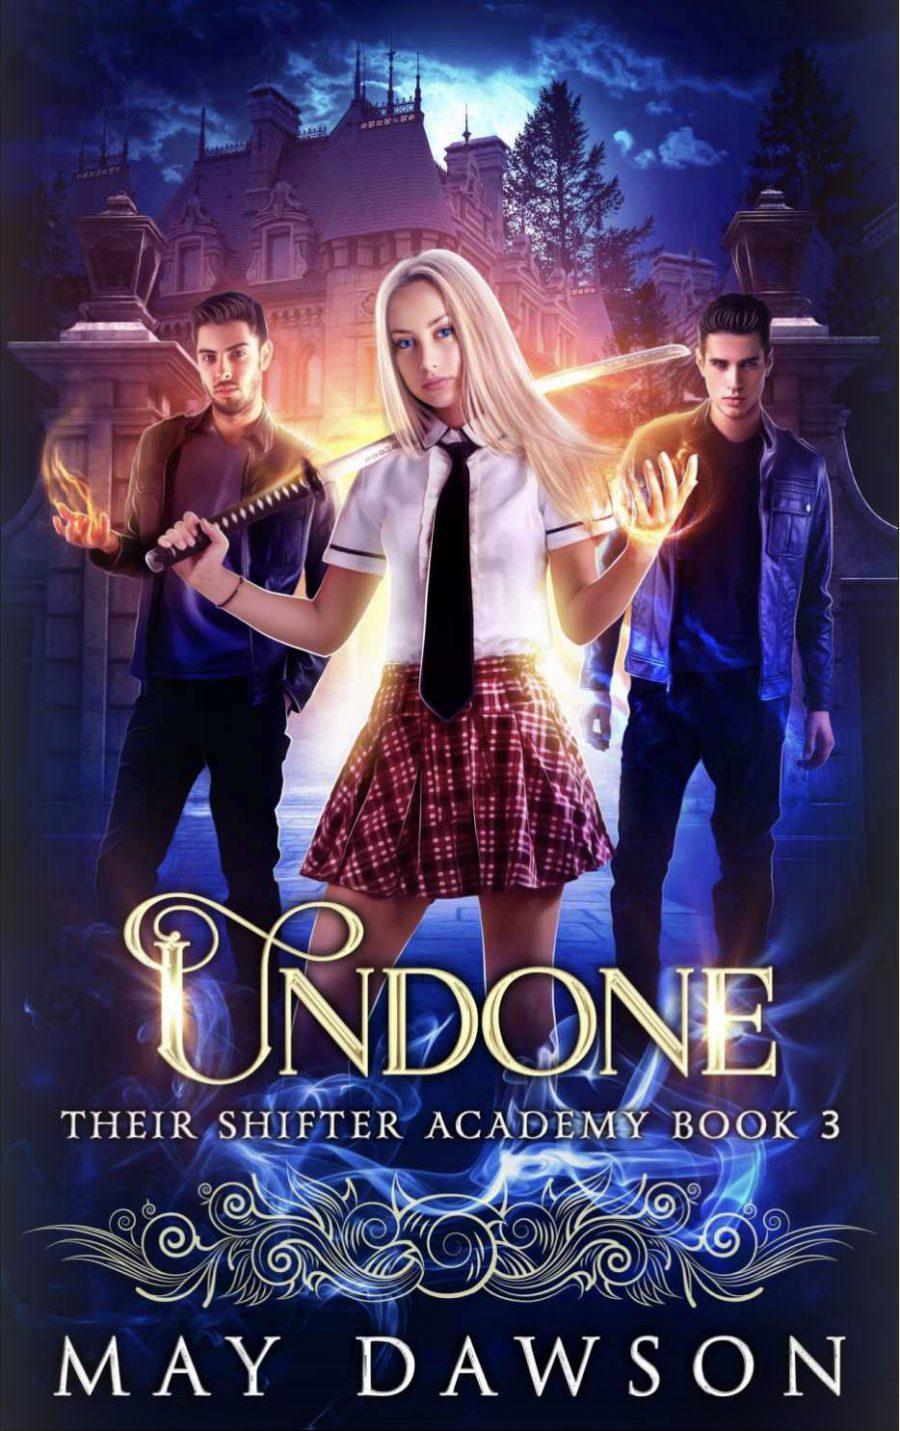 Undone by May Dawson - A Book Review #BookReview #Book3 #4Stars #Shifters #Academy #SlowBurn #RH #PNR #KindleUnlimited #KU